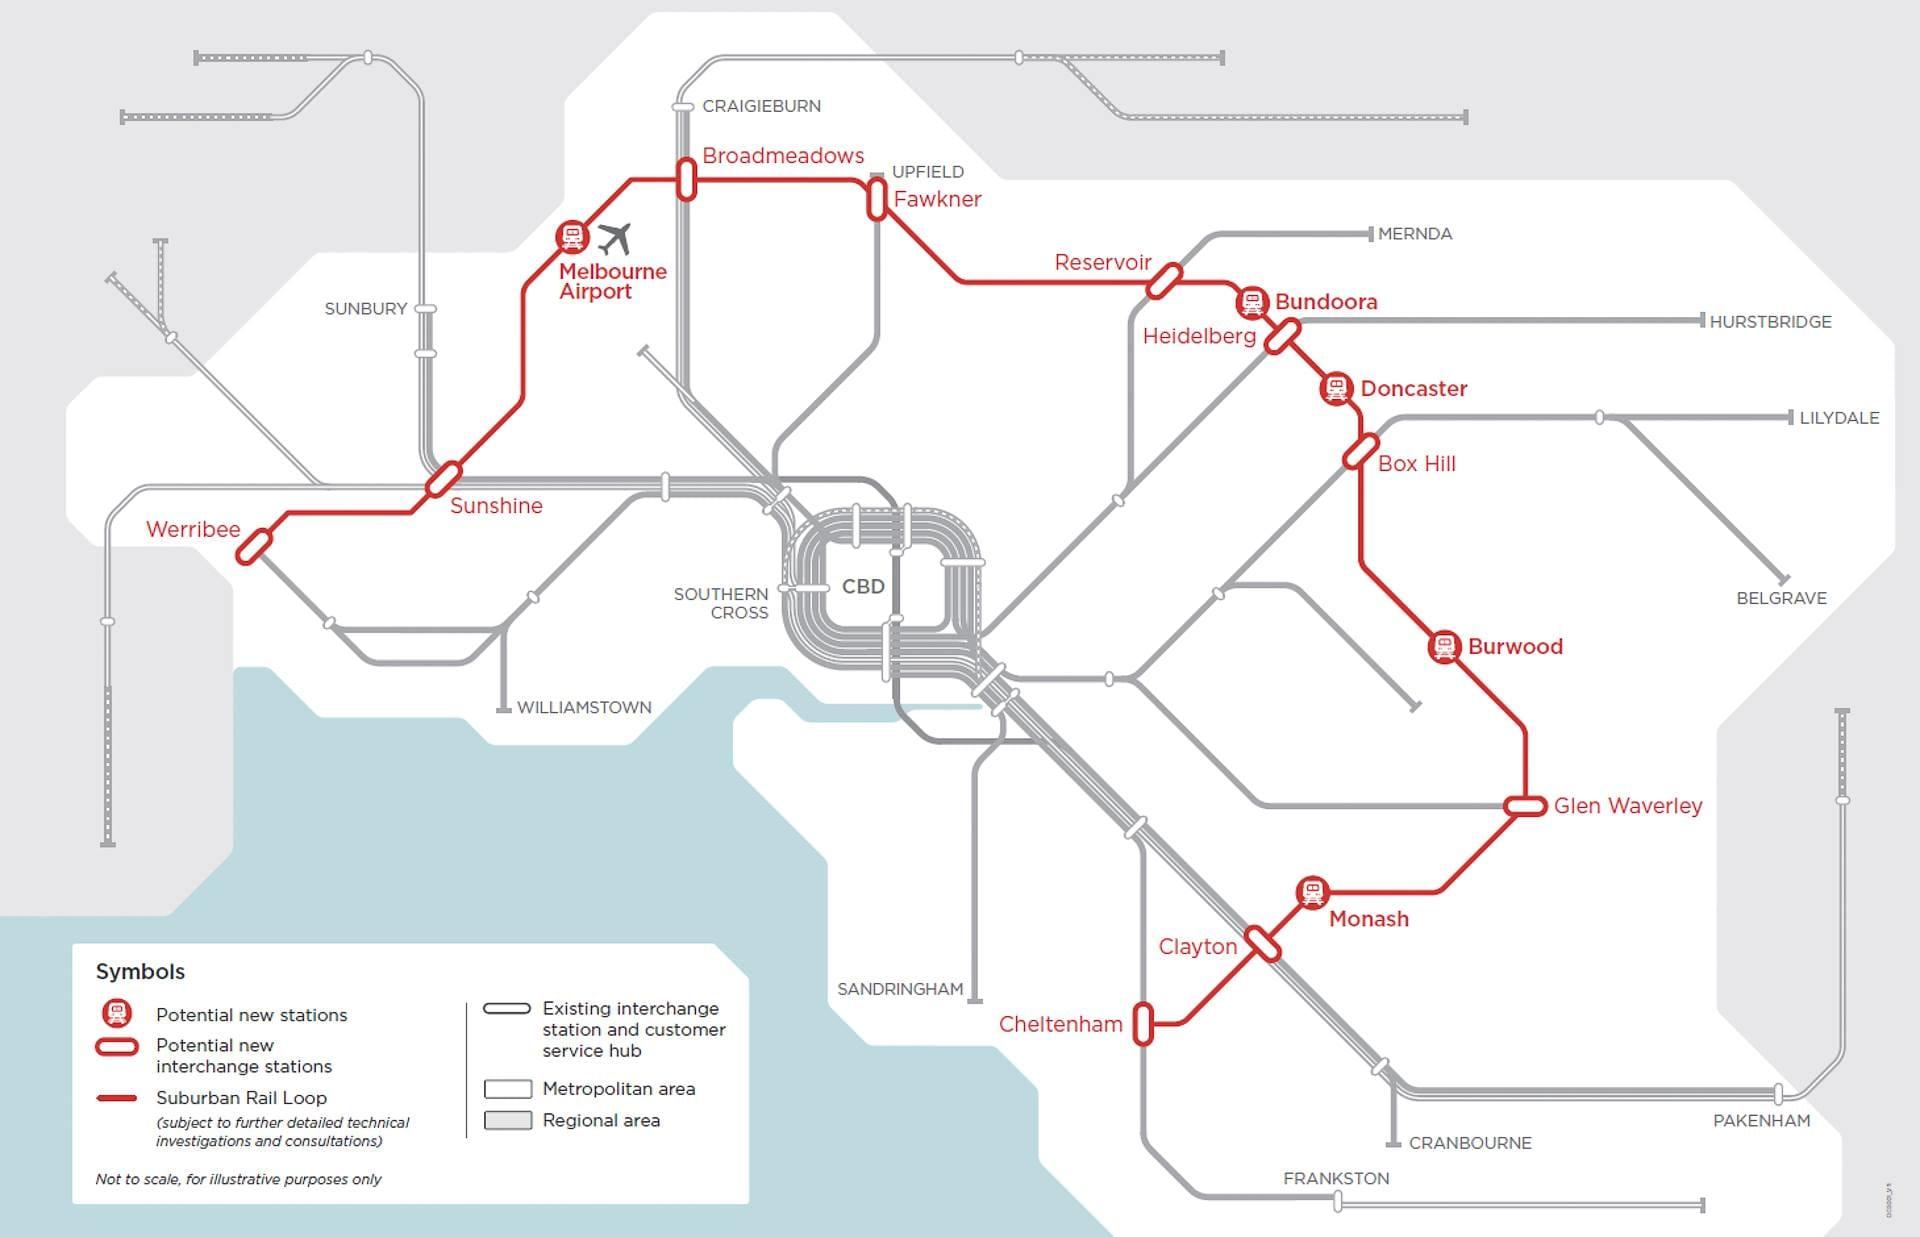 Victoria's Big Build Image of the Suburban Rail Loop Superimposed over Melbourne's Existing Suburban Rail System.